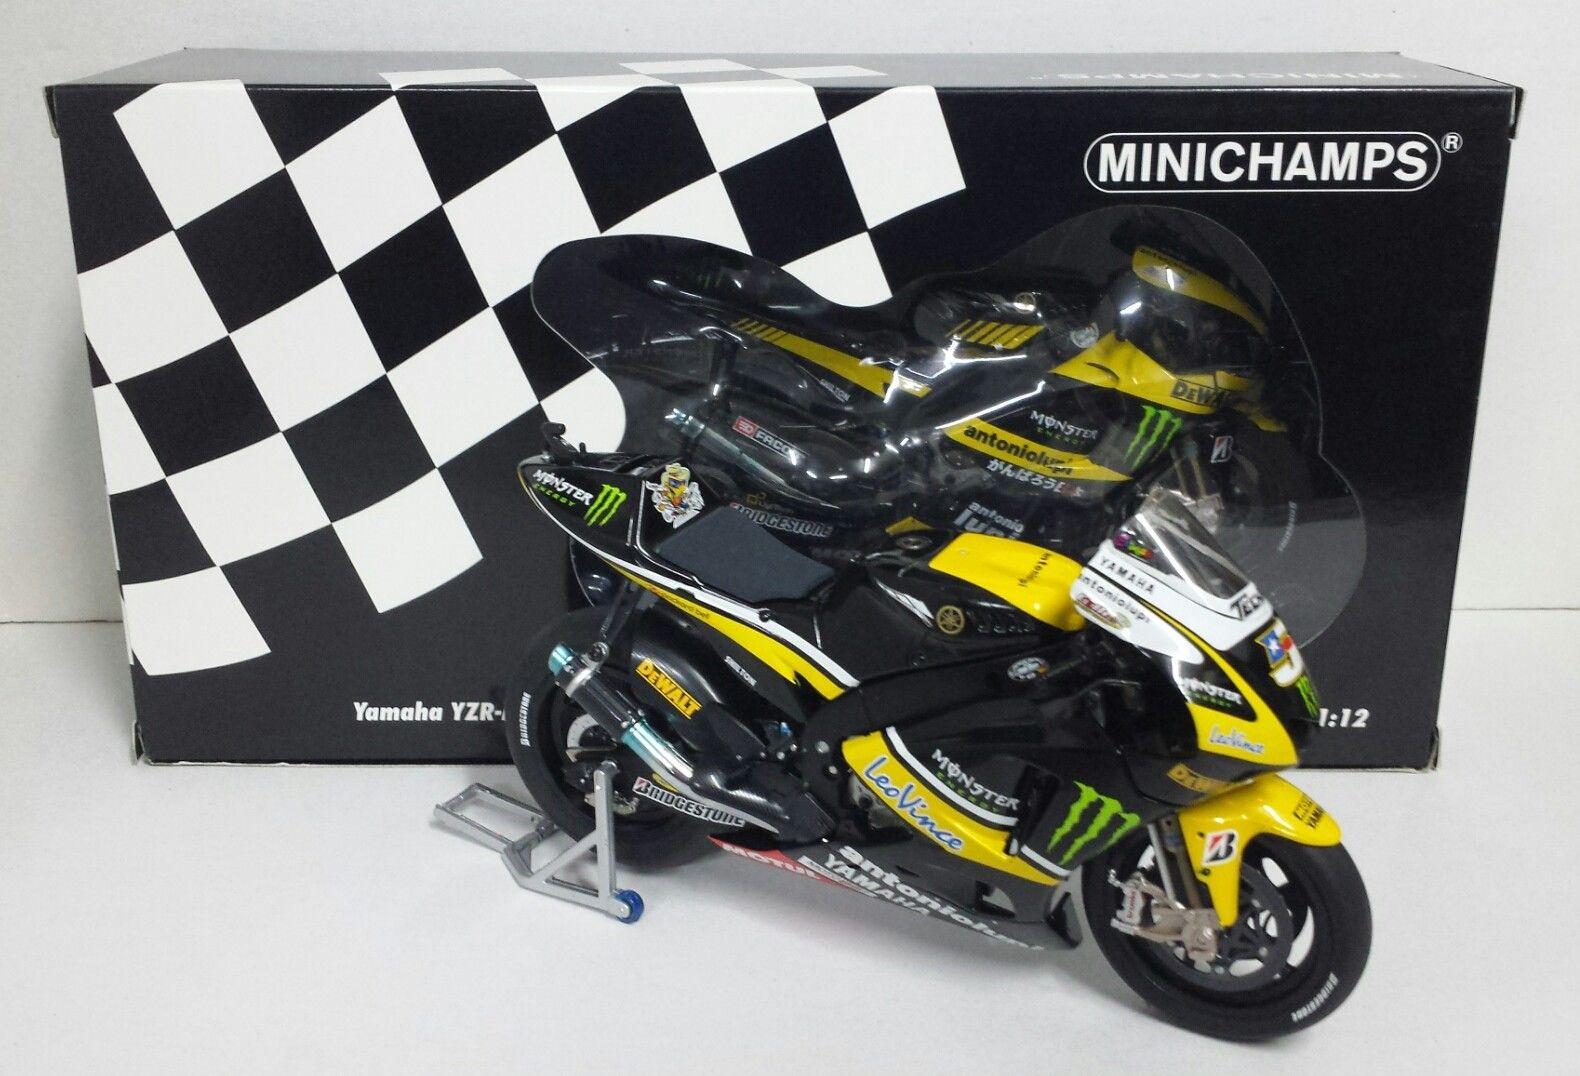 MINICHAMPS COLIN EDWARDS 1/12 YAMAHA YZR-M1 MONSTER TECH3 MOTOGP 2010 NEW